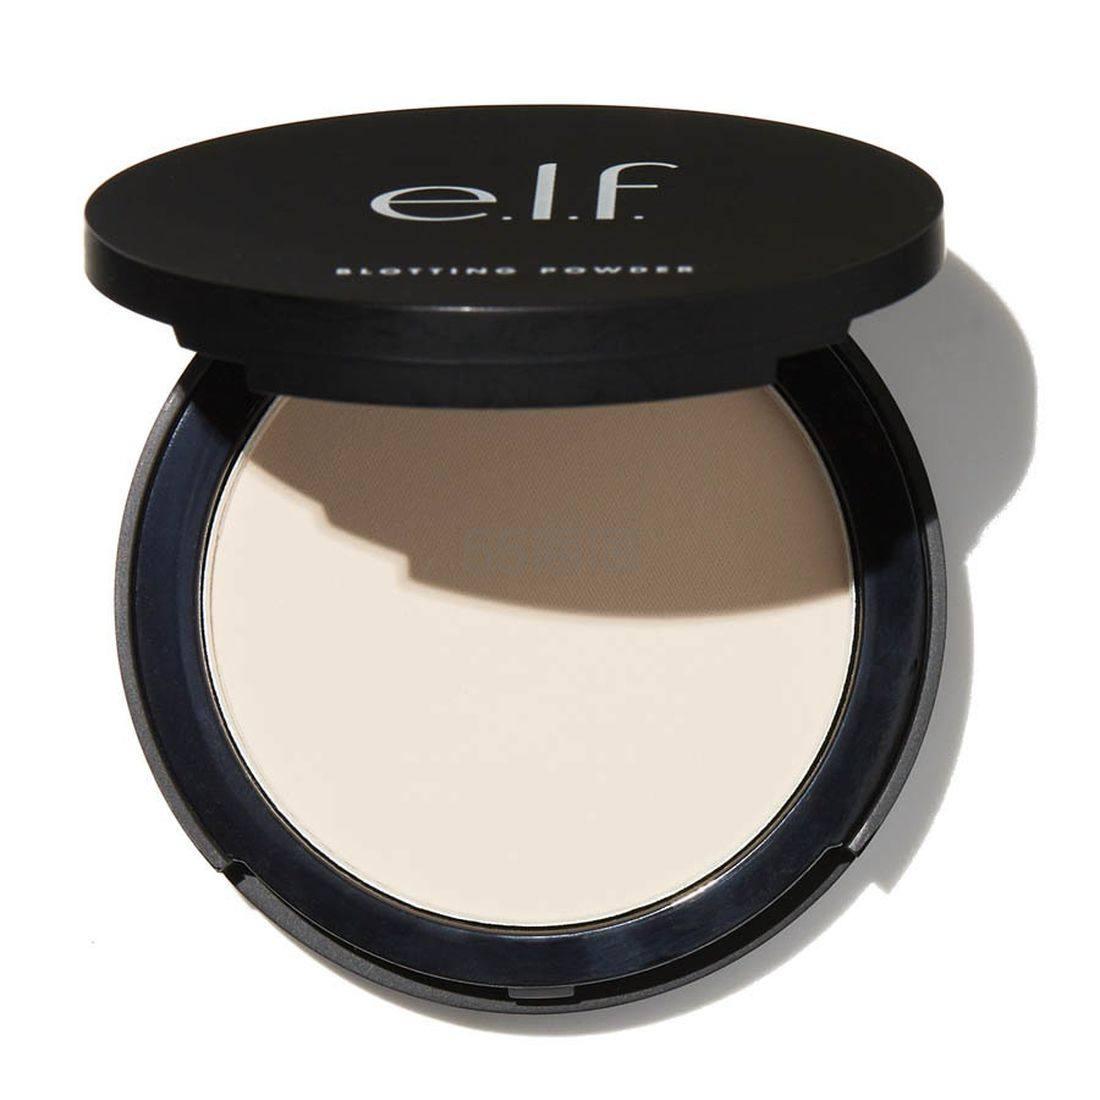 ELF Cosmetics 控油蜜粉饼 .4(约16元) - 海淘优惠海淘折扣|55海淘网